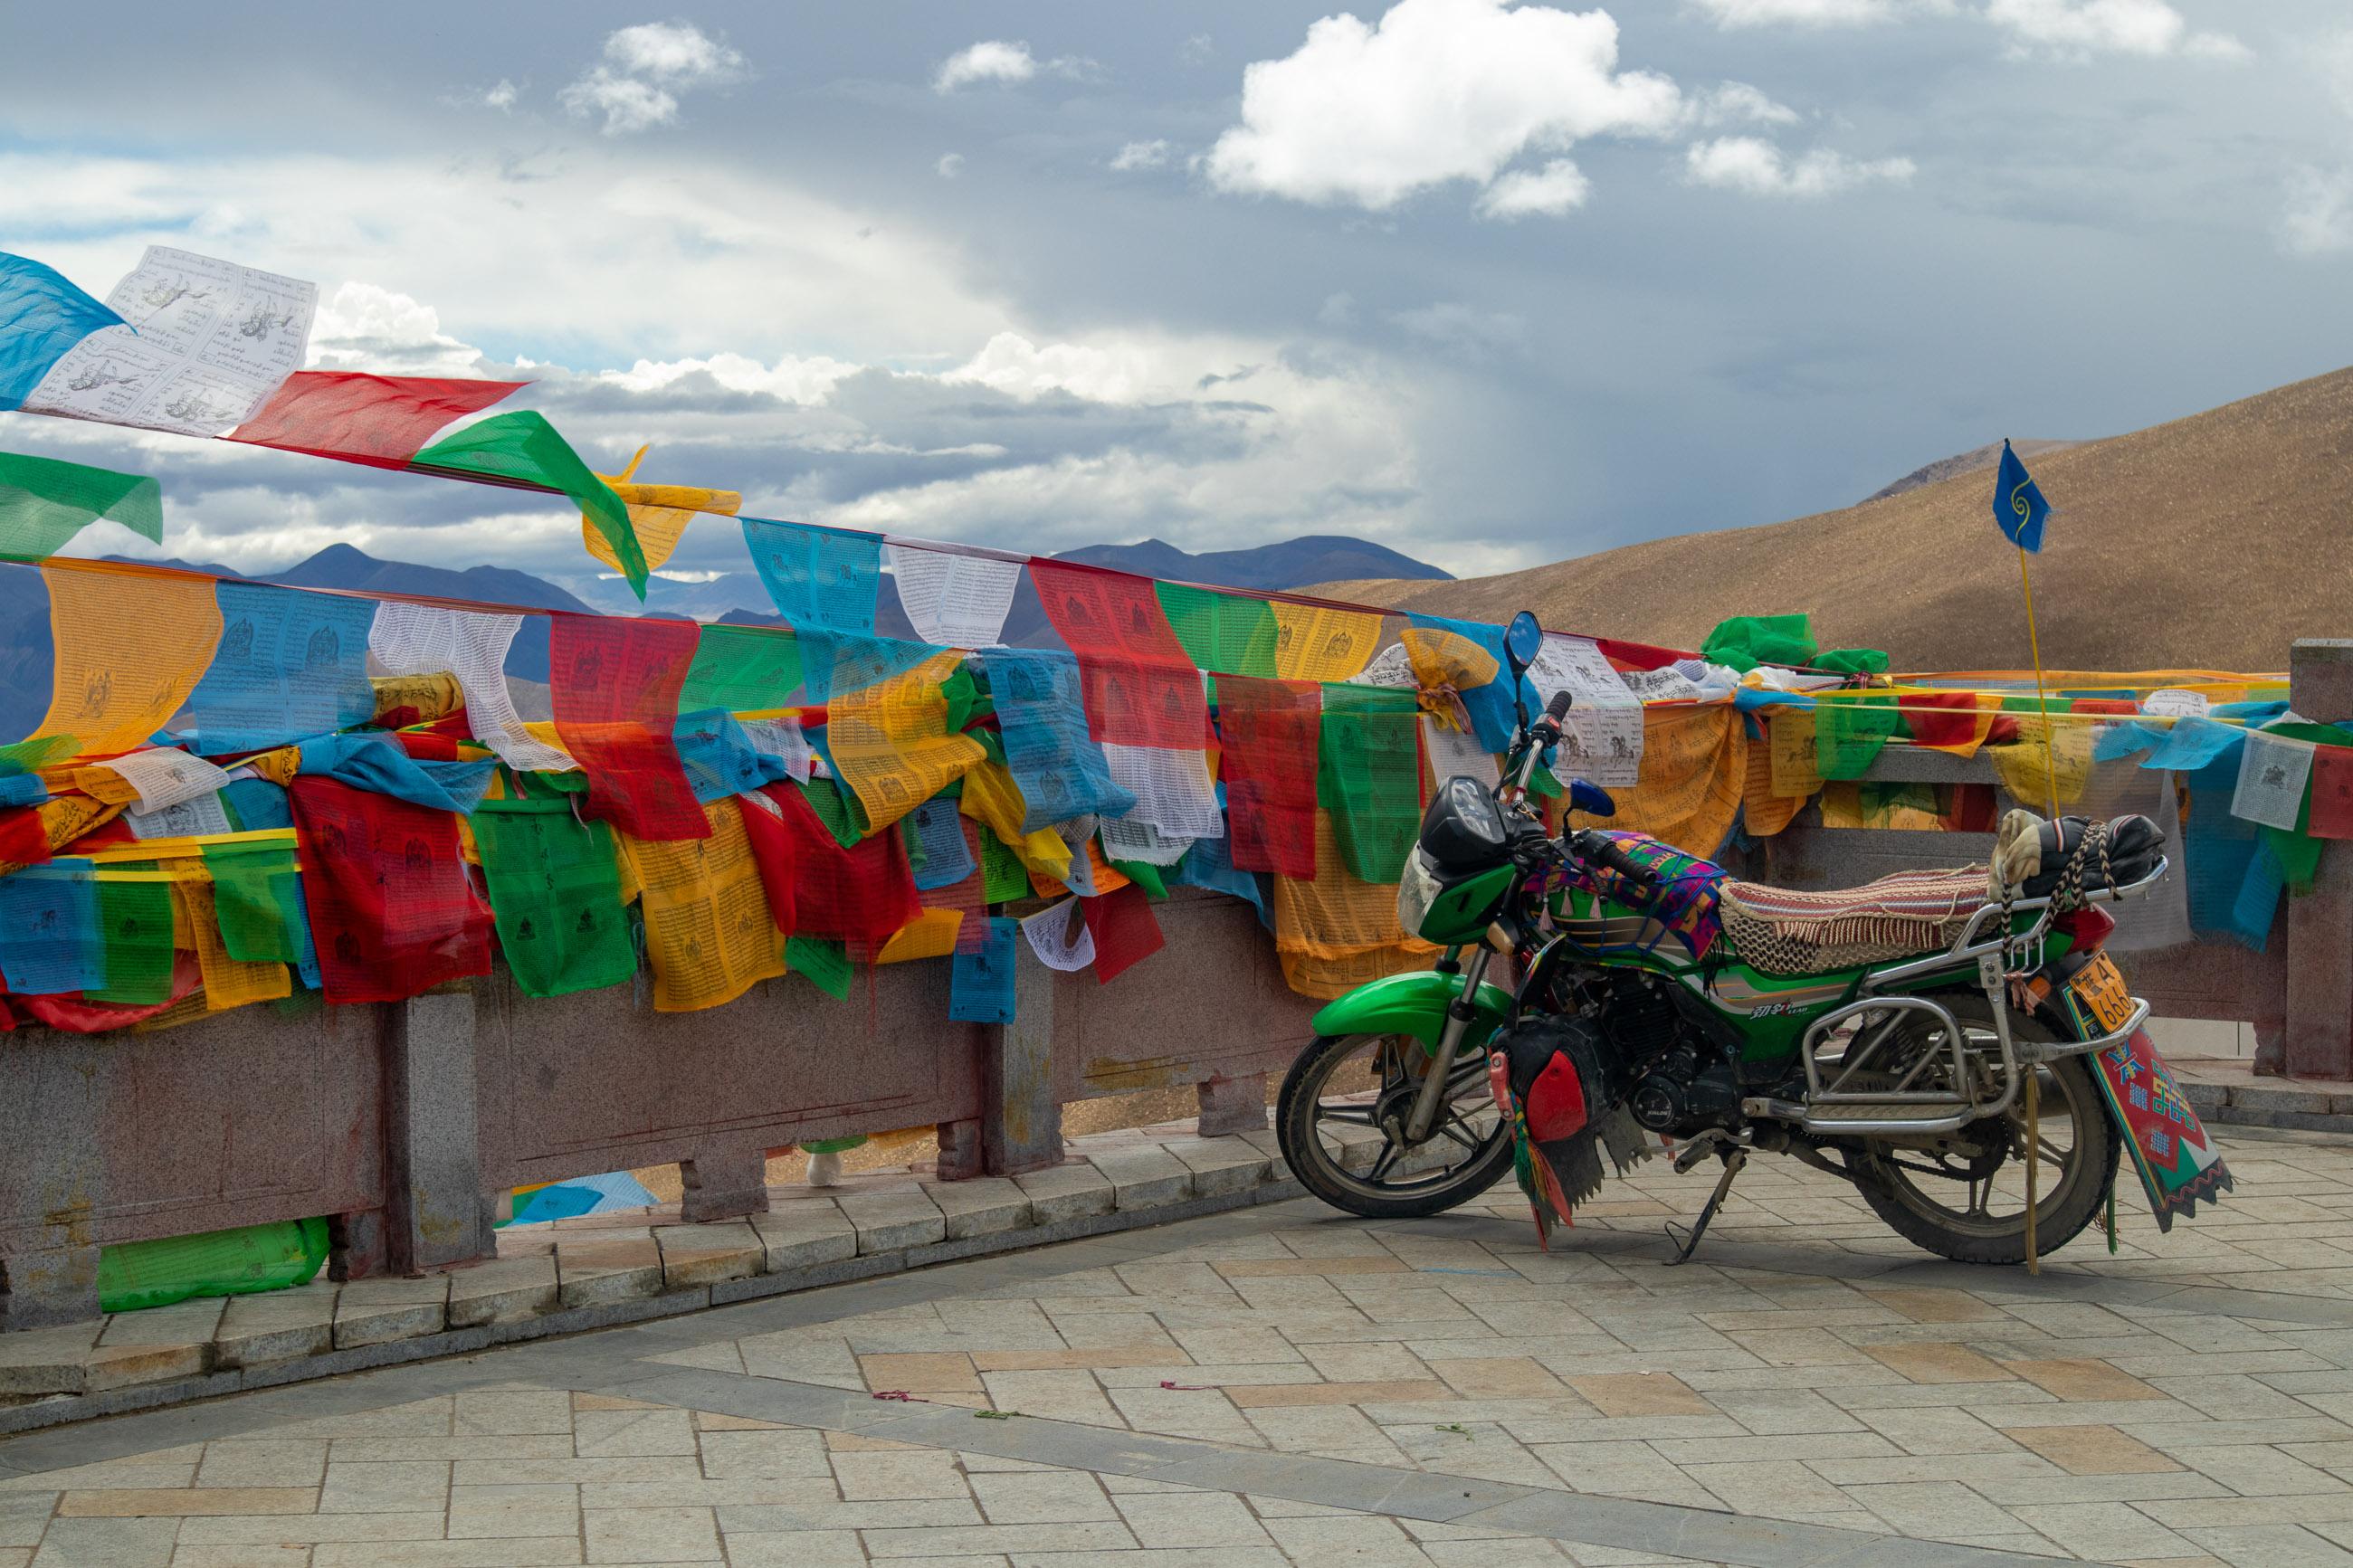 https://bubo.sk/uploads/galleries/16317/nikol_deckous_img_tibet_1221-41.jpg